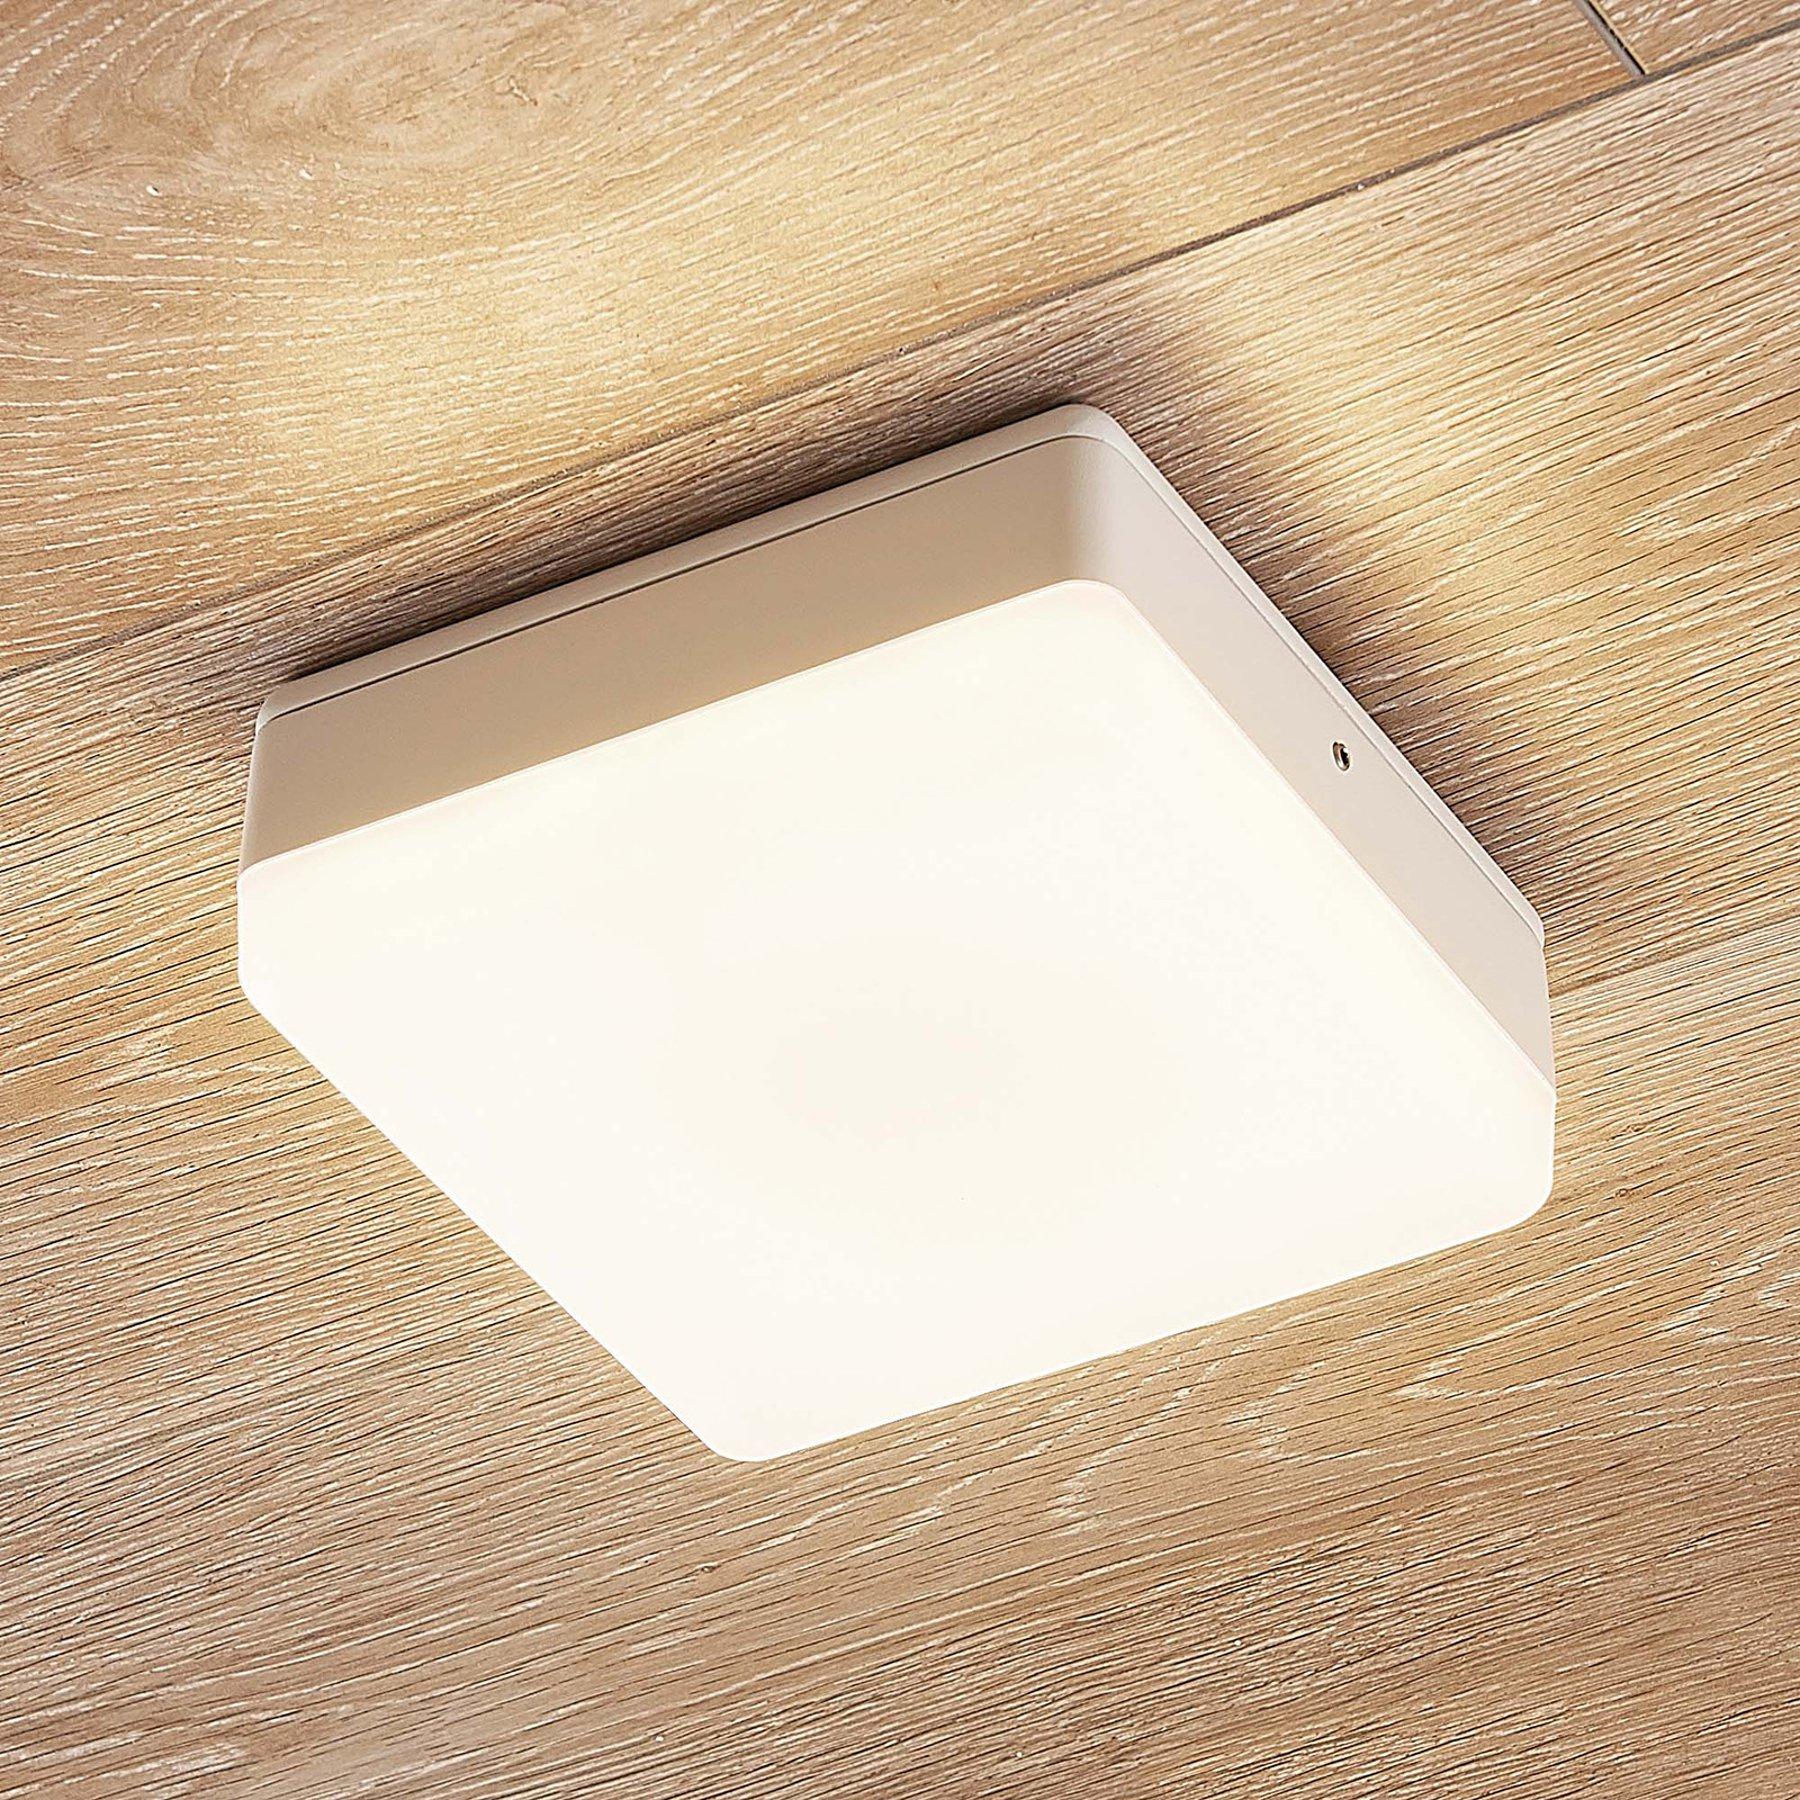 LED-taklampe Thilo, IP54, hvit, 16 cm, HF-sensor